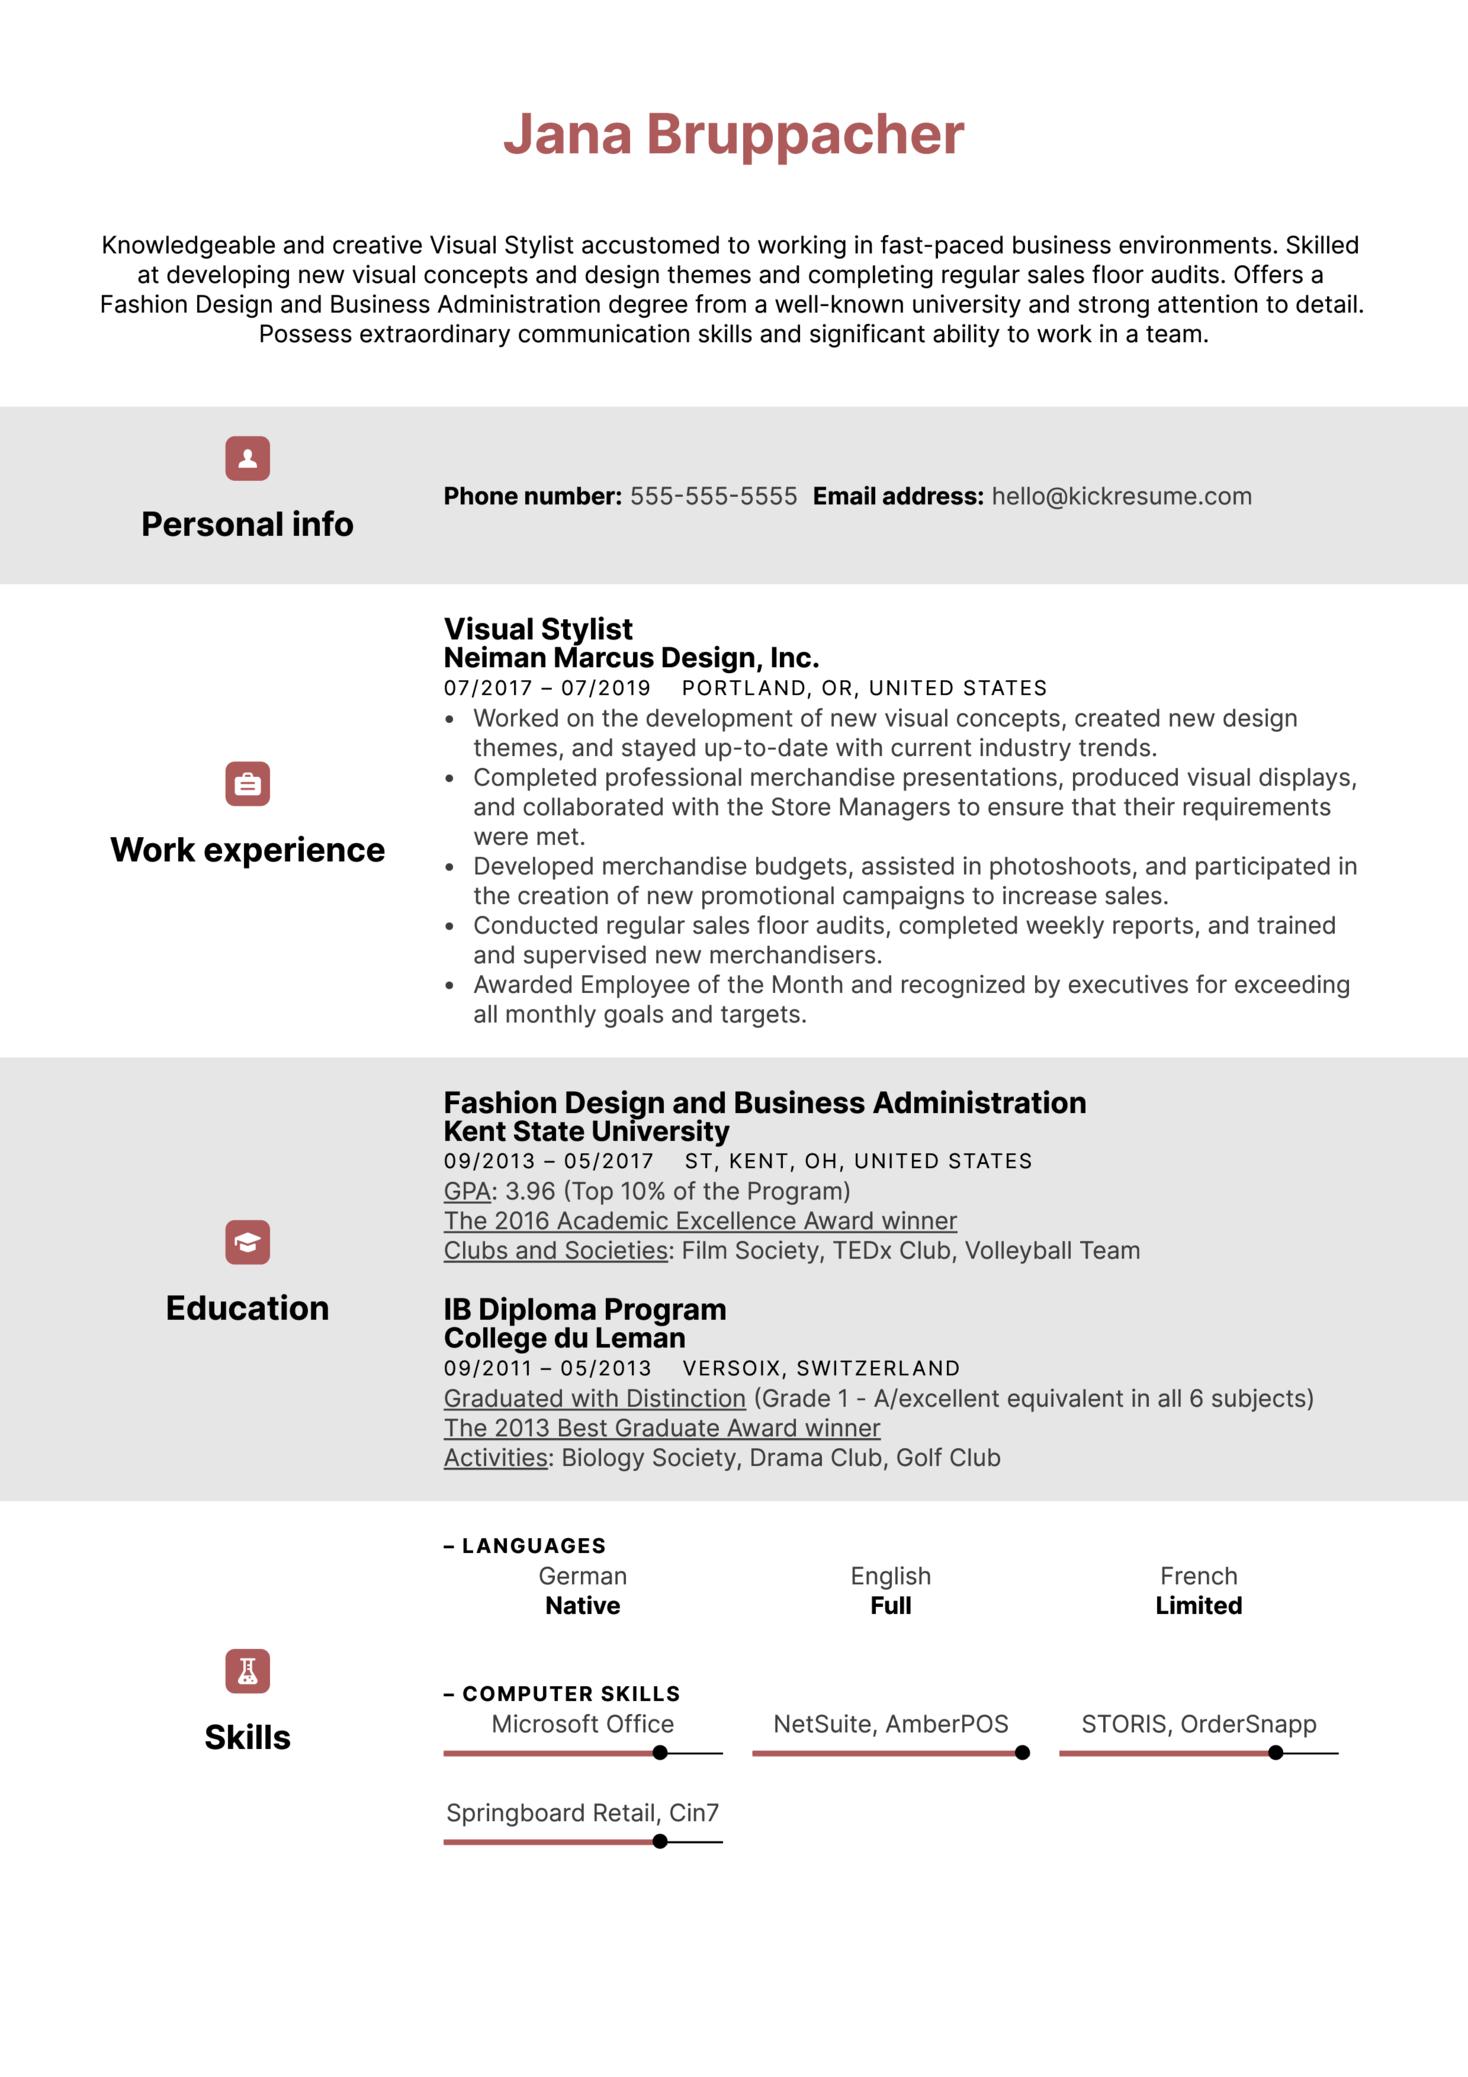 Visual Stylist Resume Example (Part 1)